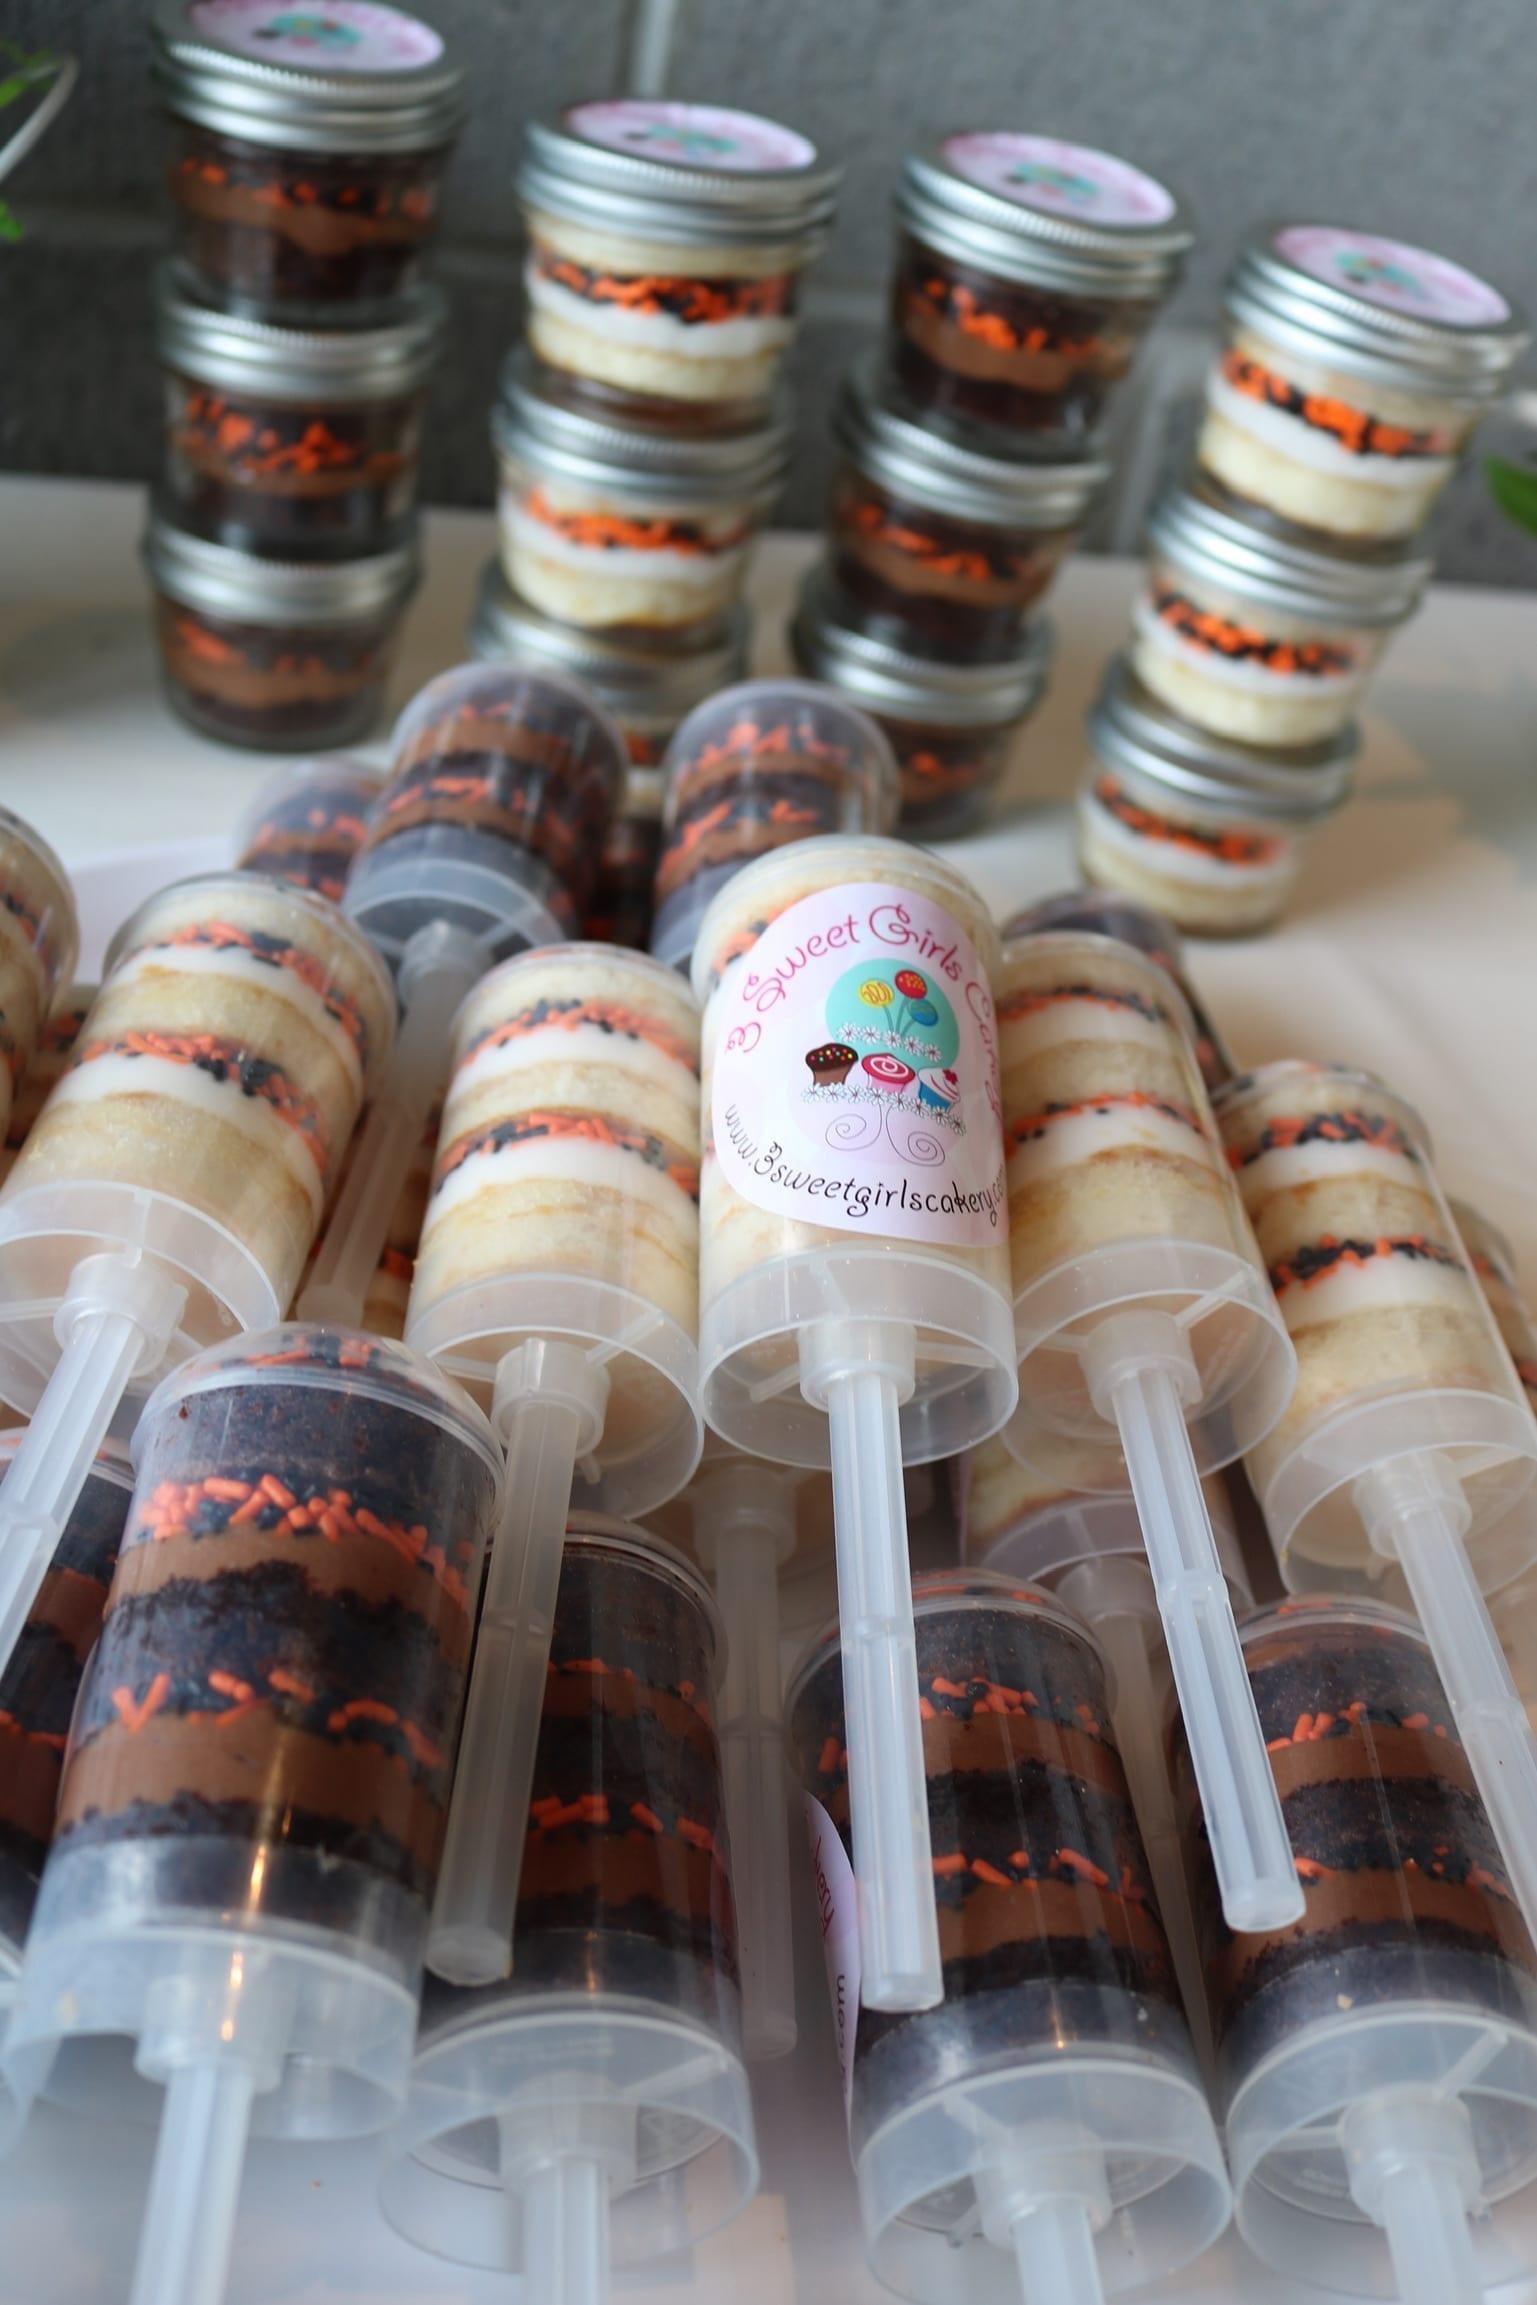 Cake Push Ups and Cupcake in a Jar | 3 Sweet Girls Cakery